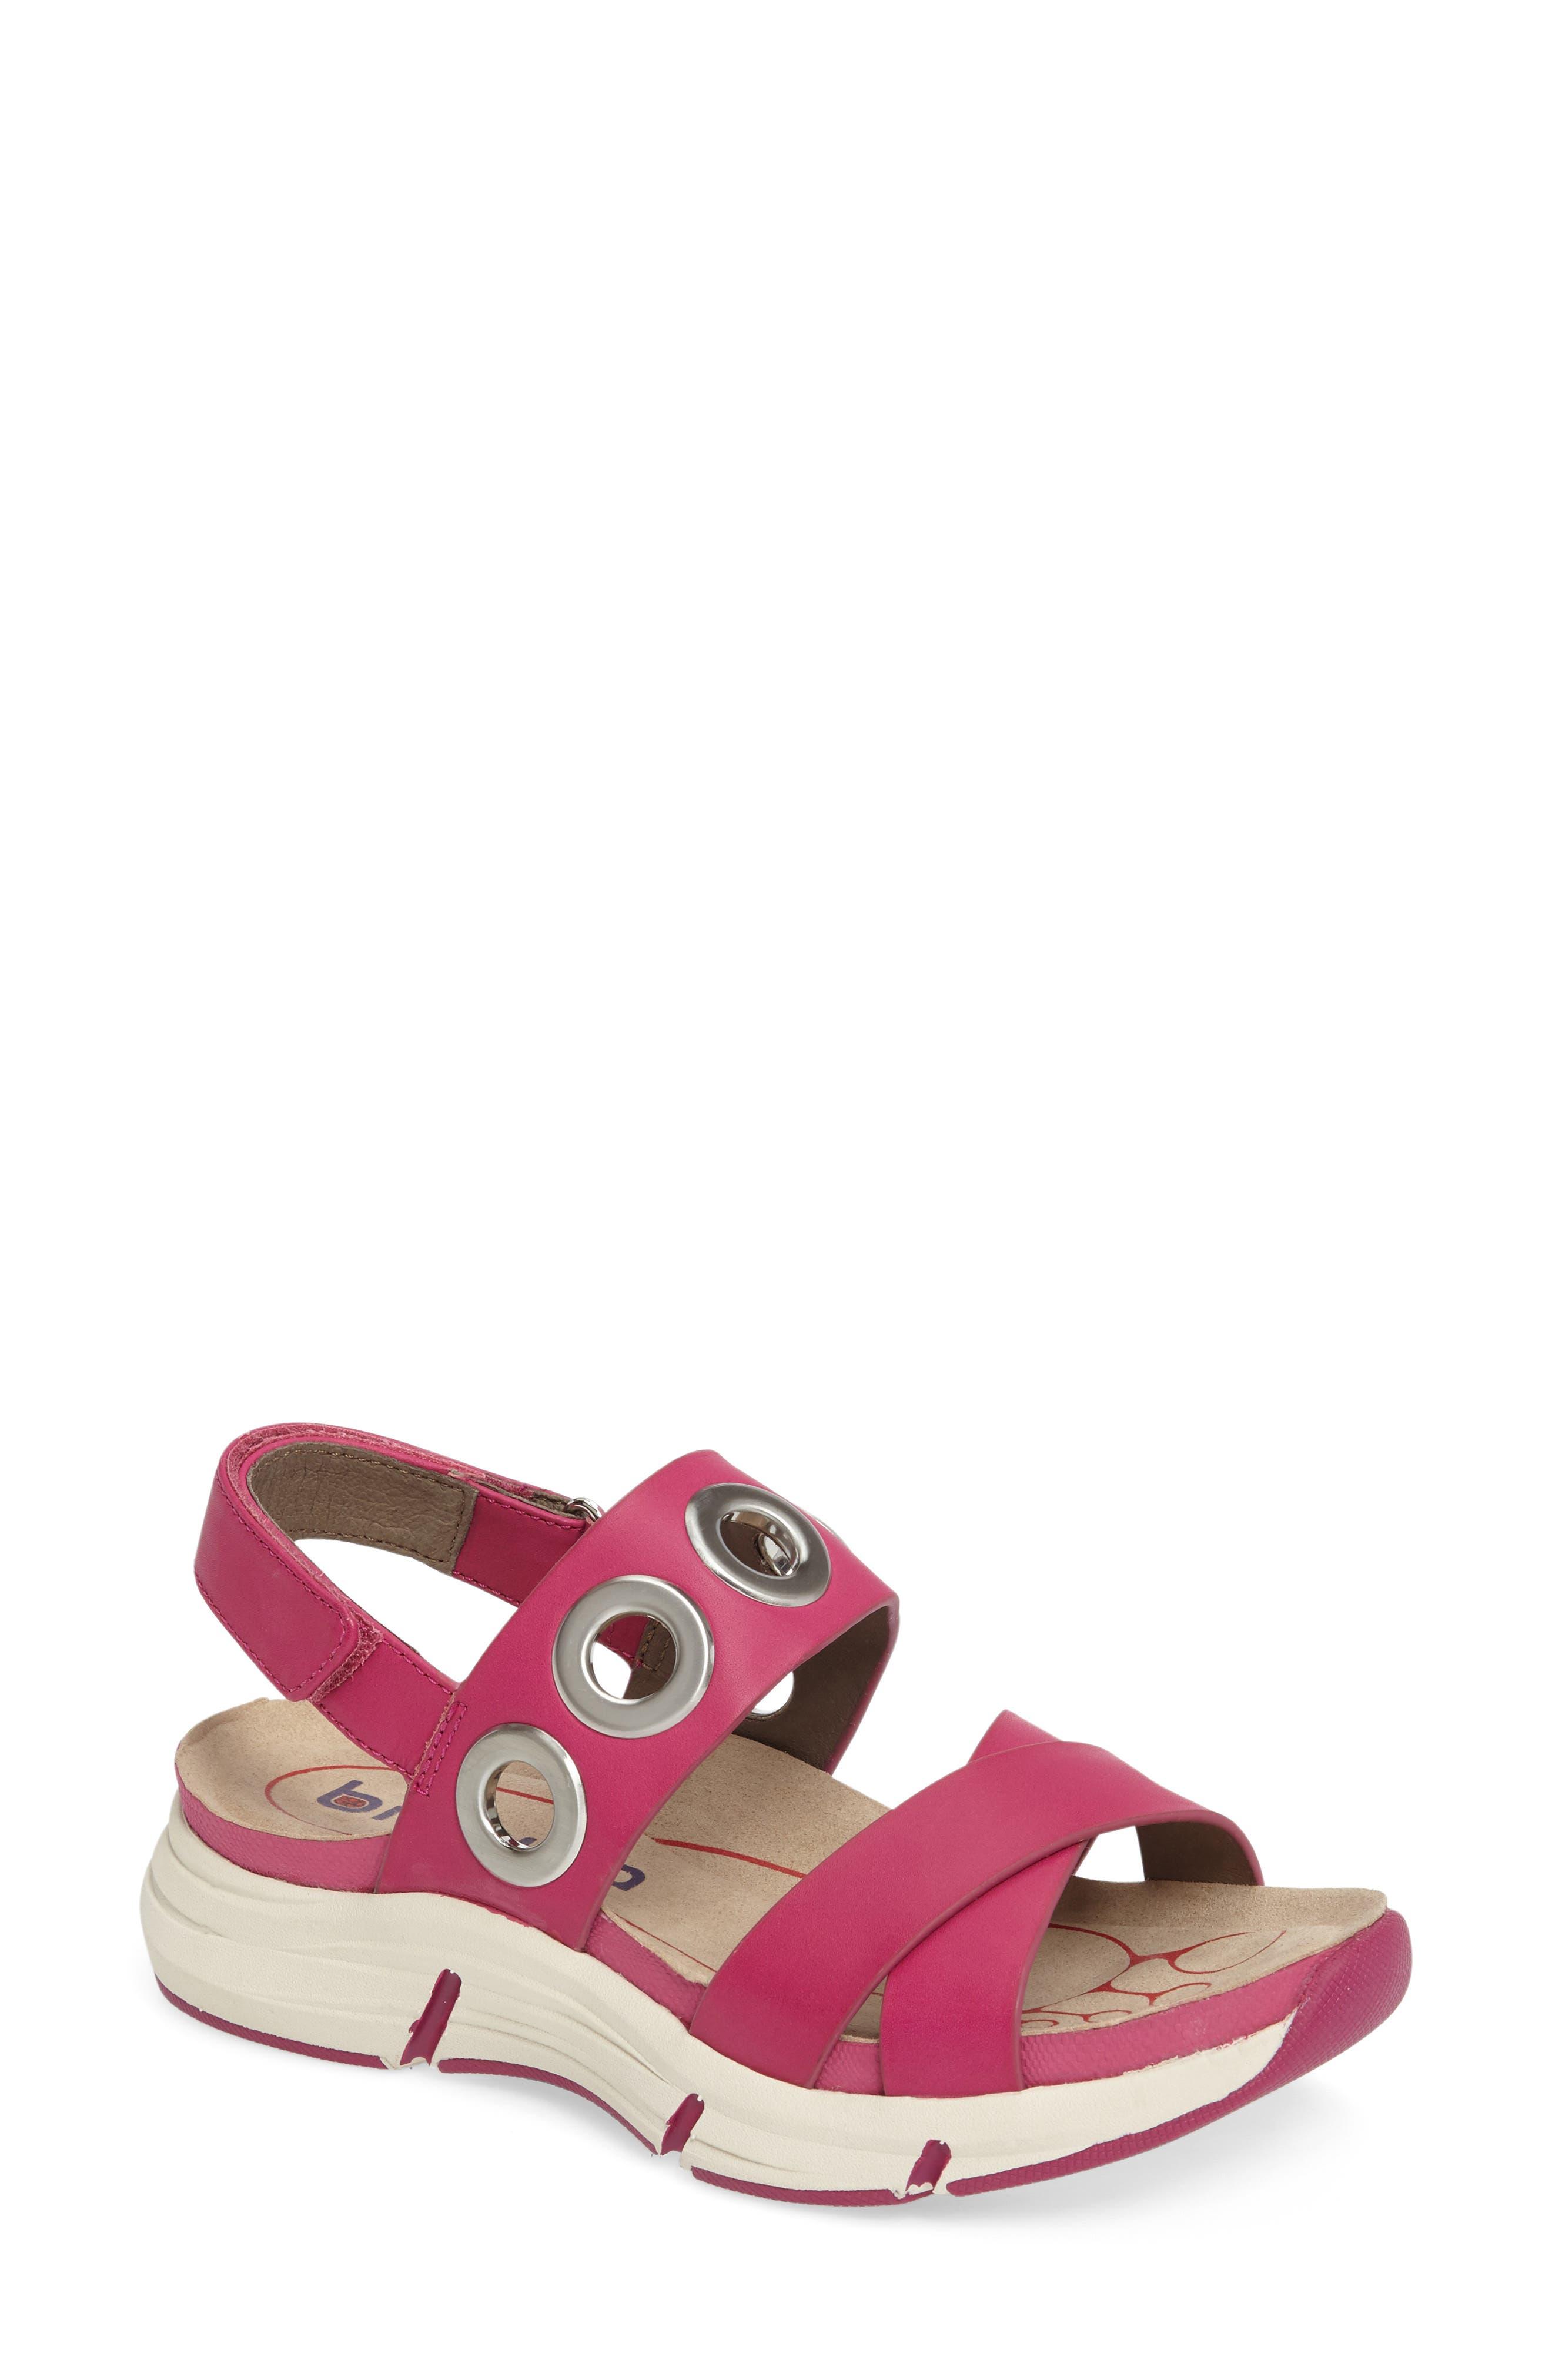 Main Image - bionica Olney Sandal (Women)